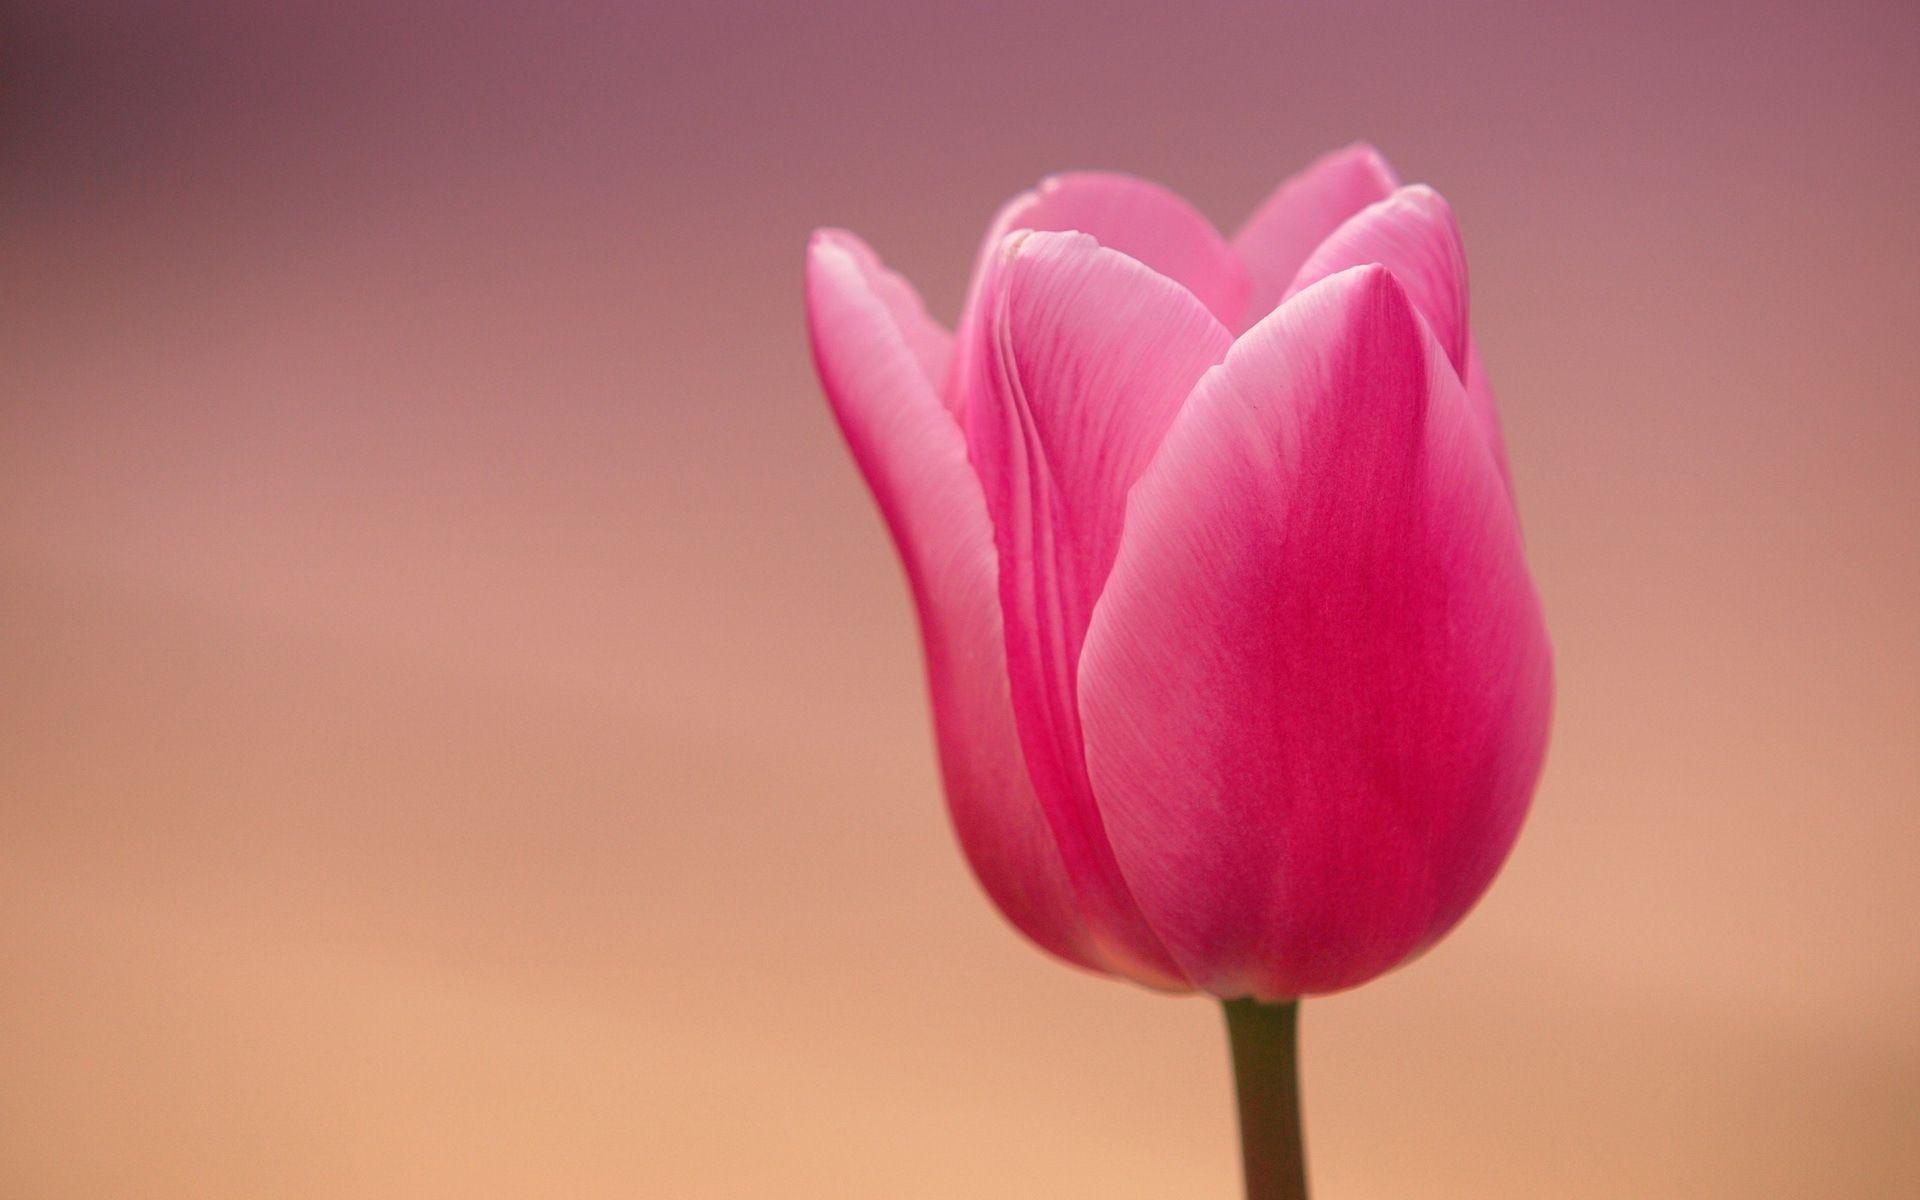 tulip background images